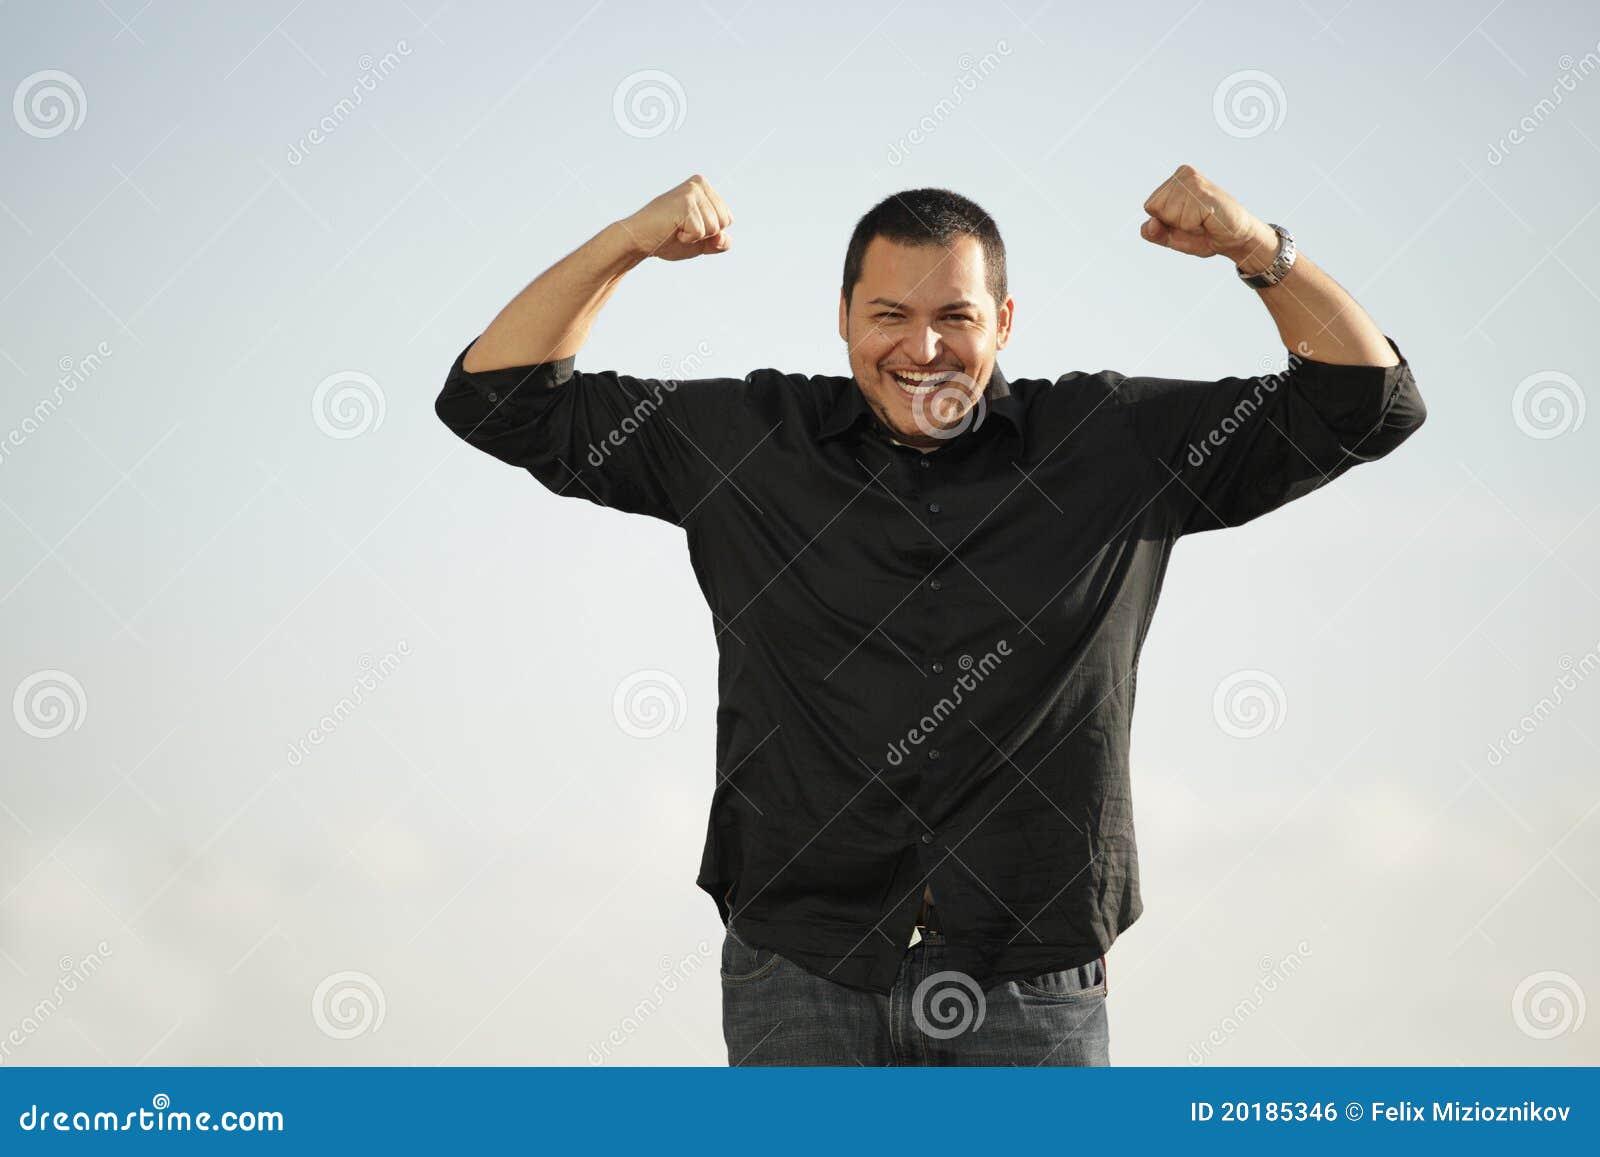 Man flexing his arms